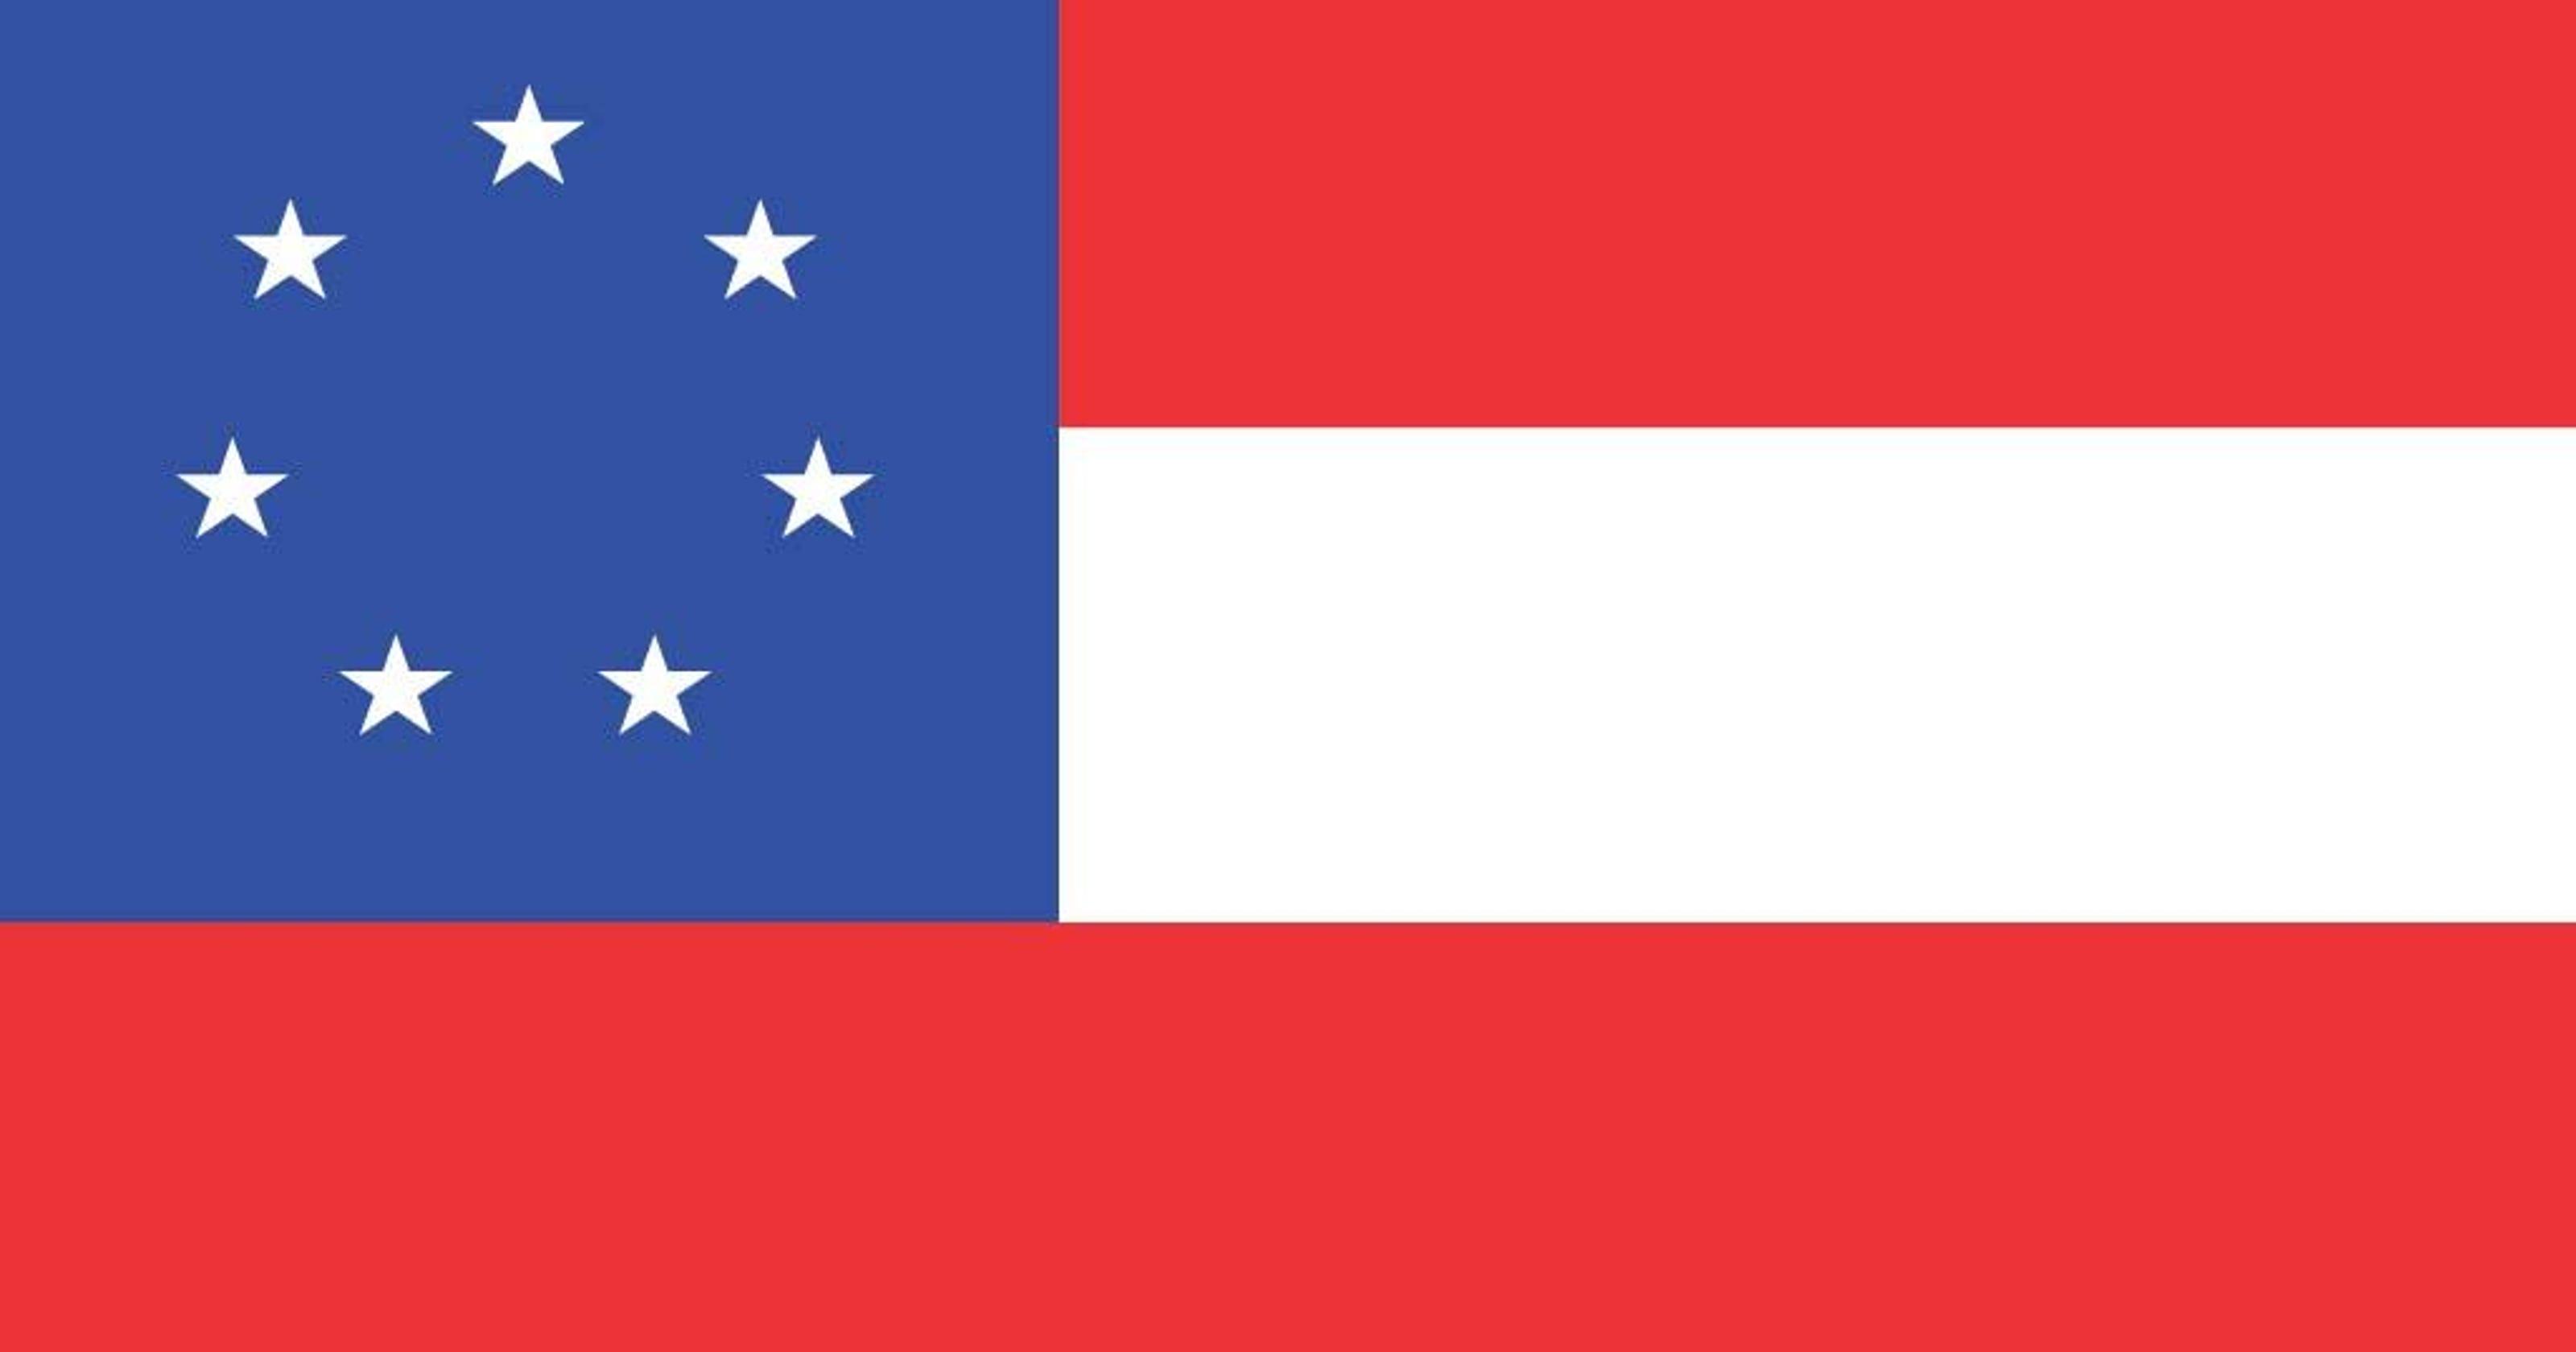 Stars, bars, magnolias: Miss., Confederate flag history